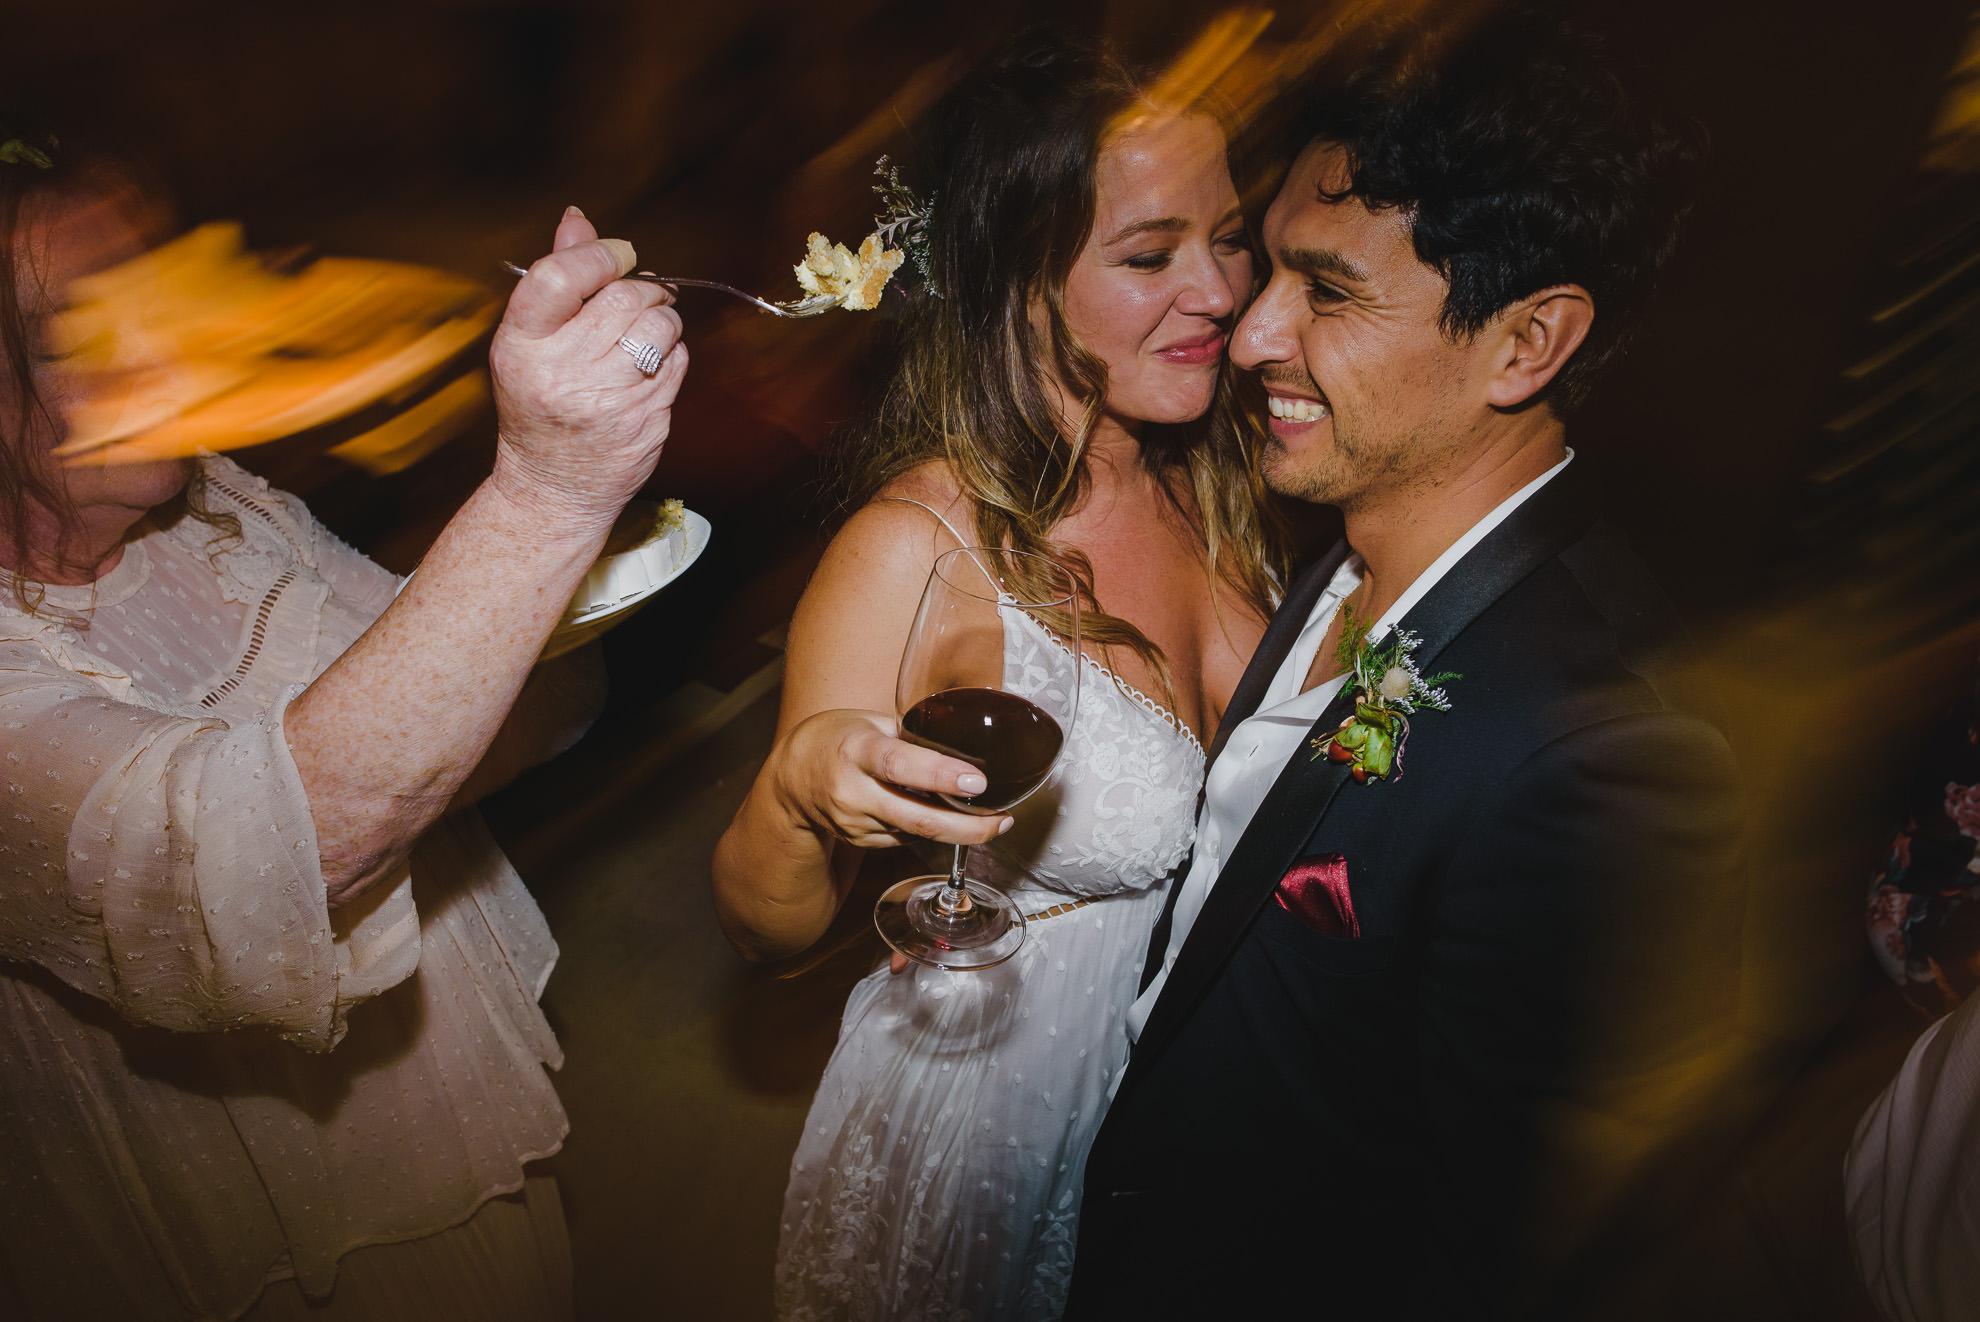 wedding casablanca valley-43.jpg